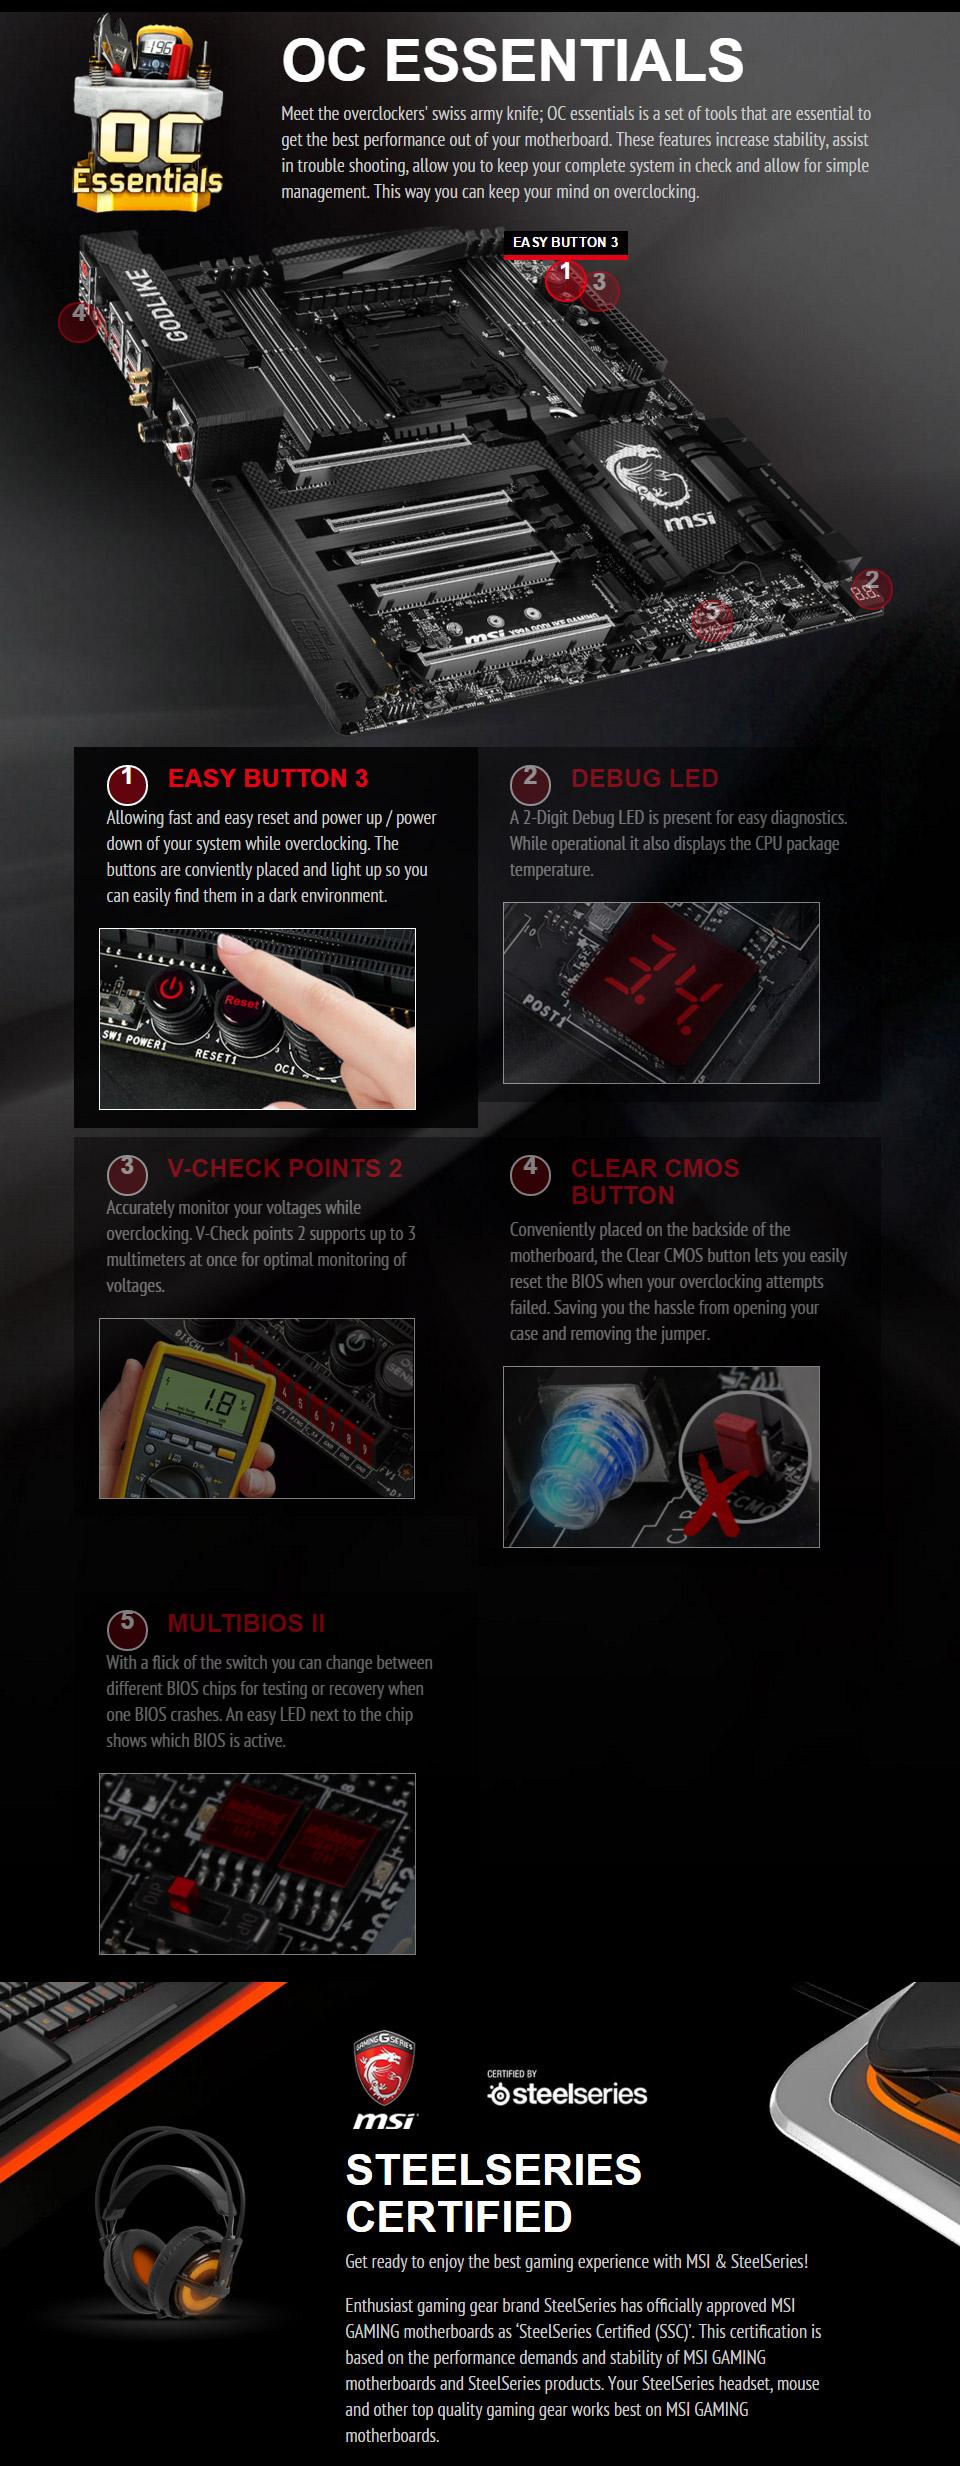 Msi X99a Godlike Gaming Carbon Rgb Motherboard Wifi 80211ac Bluetooth 40 Hd Audio Oc Genie 4 Nahimic Enhacer Click Bios E Atx Form Factor Backed By A 3 Year Warranty